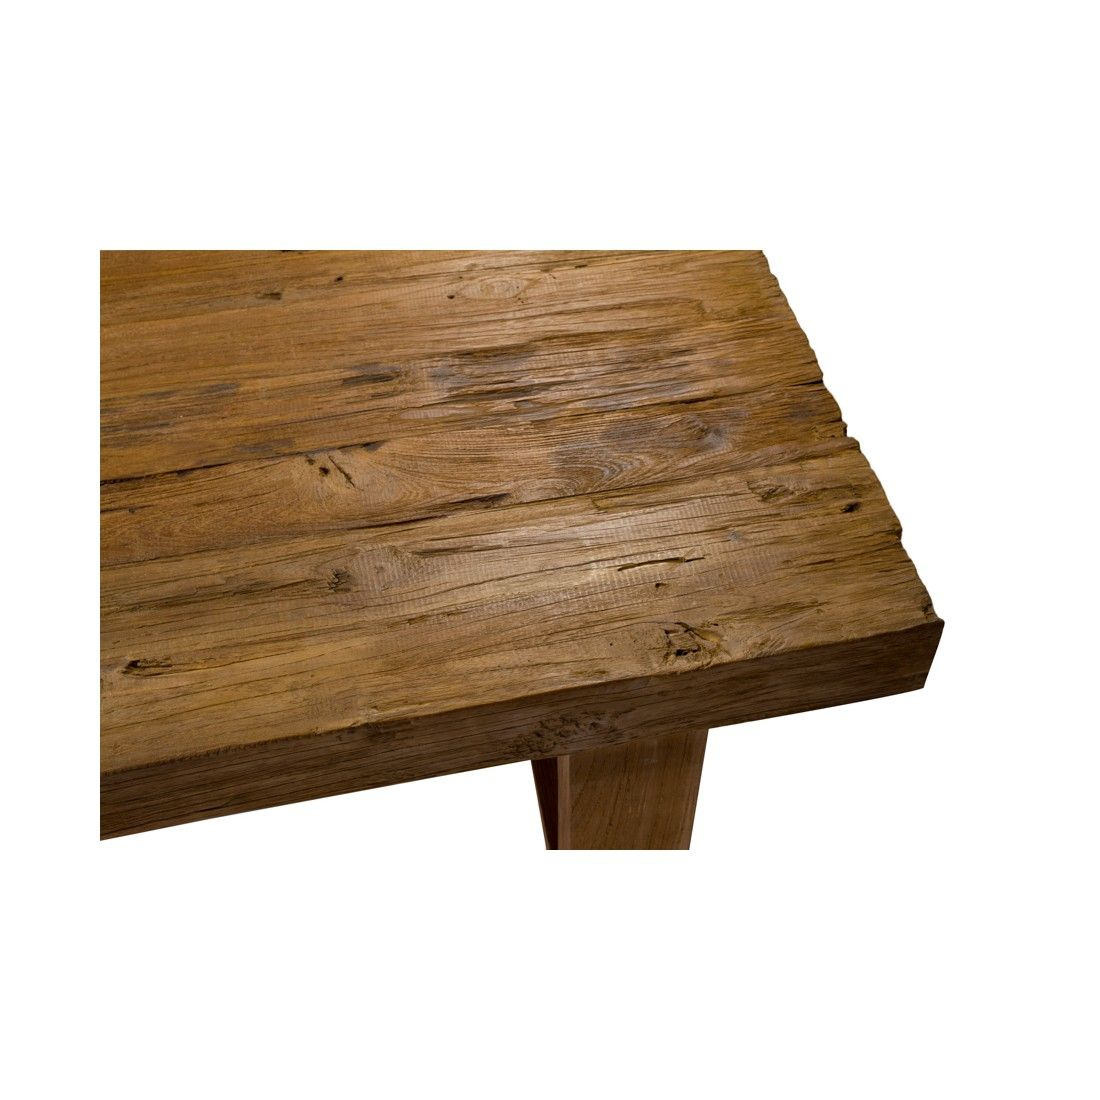 Table basse en teck ancien 130 cm